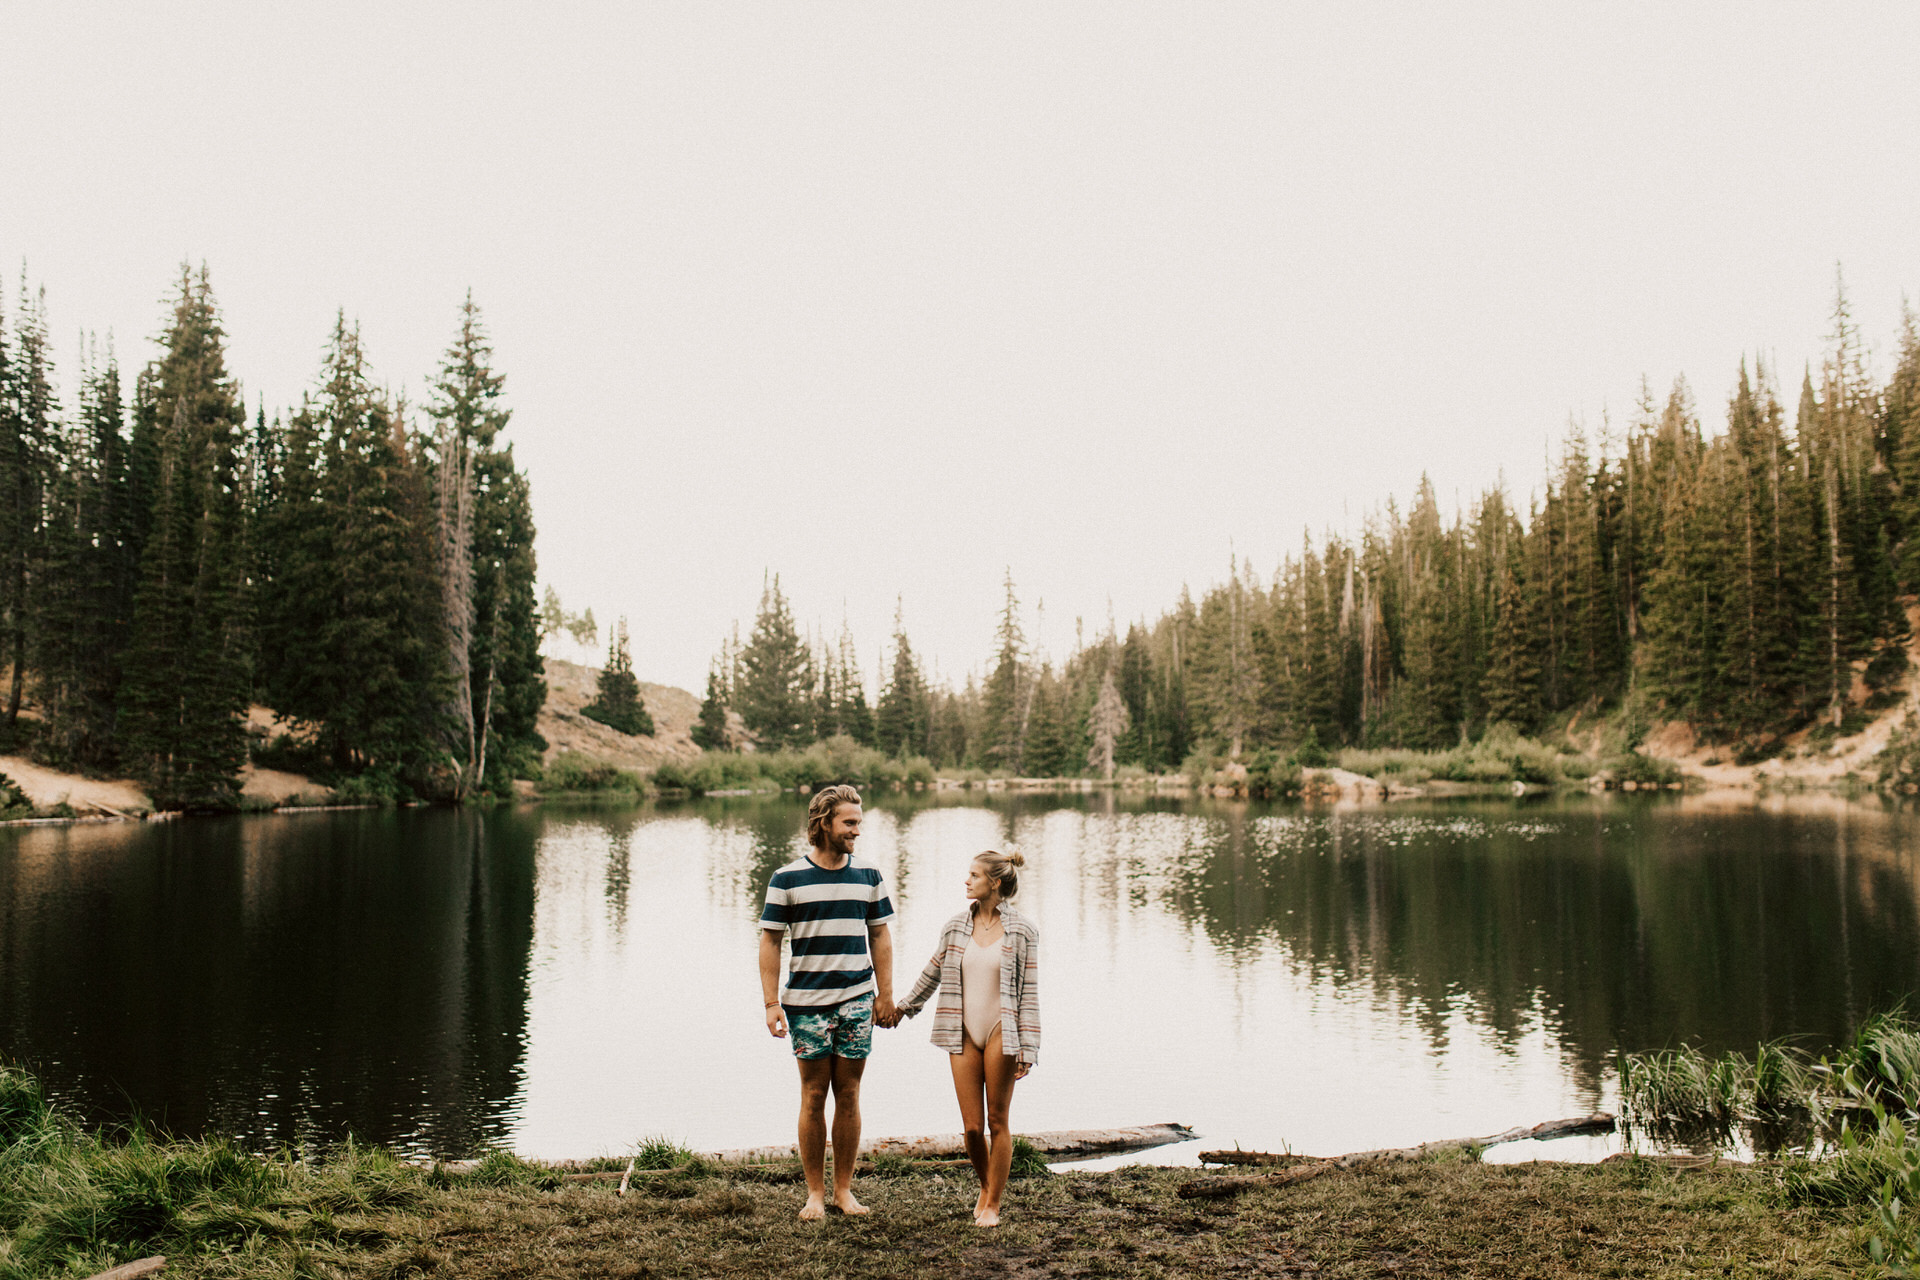 IMG 2134 - Waterfall anniversary in the woods of Yellowstone National Park